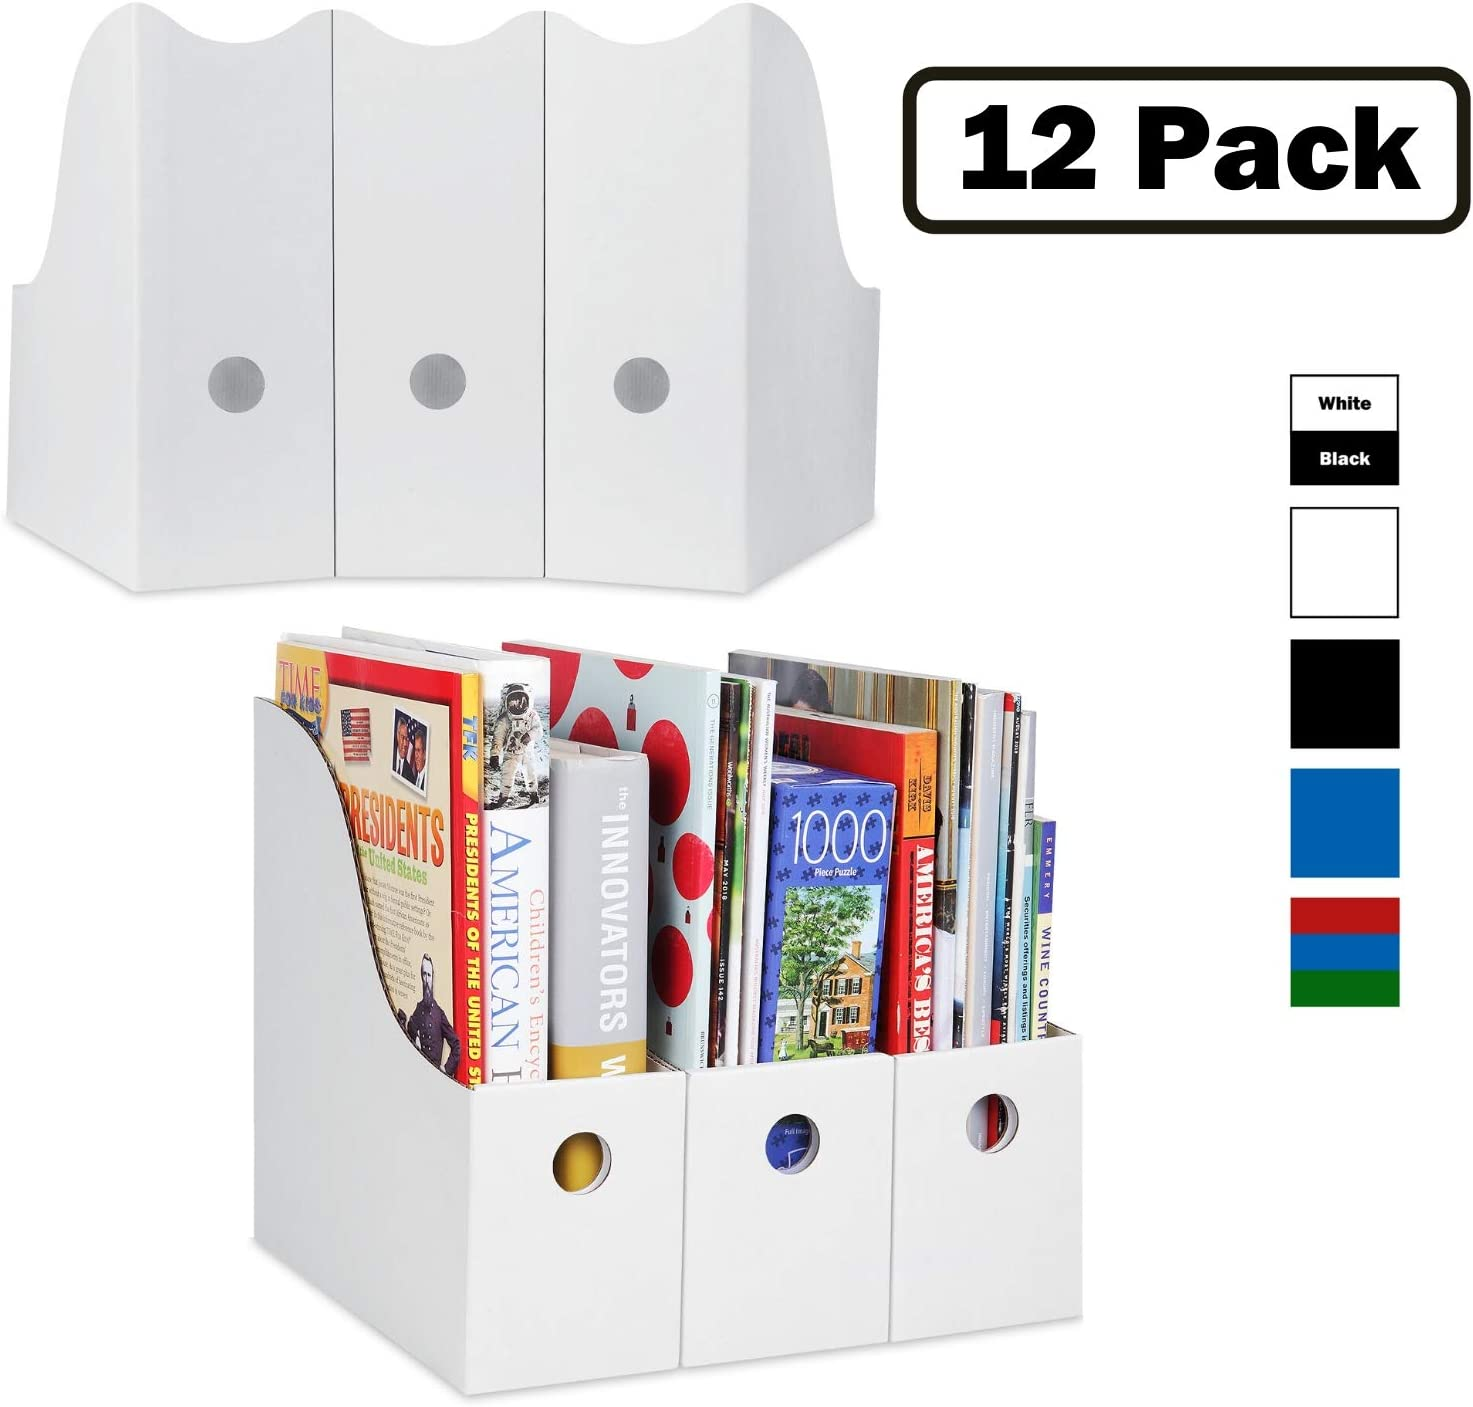 Magazine File Holder (Set of 12, White), Sturdy Cardboard Magazine Holders, Folder Holder, Magazine Storage Box, Book Bins, Desk File Holder Organizers and Storage